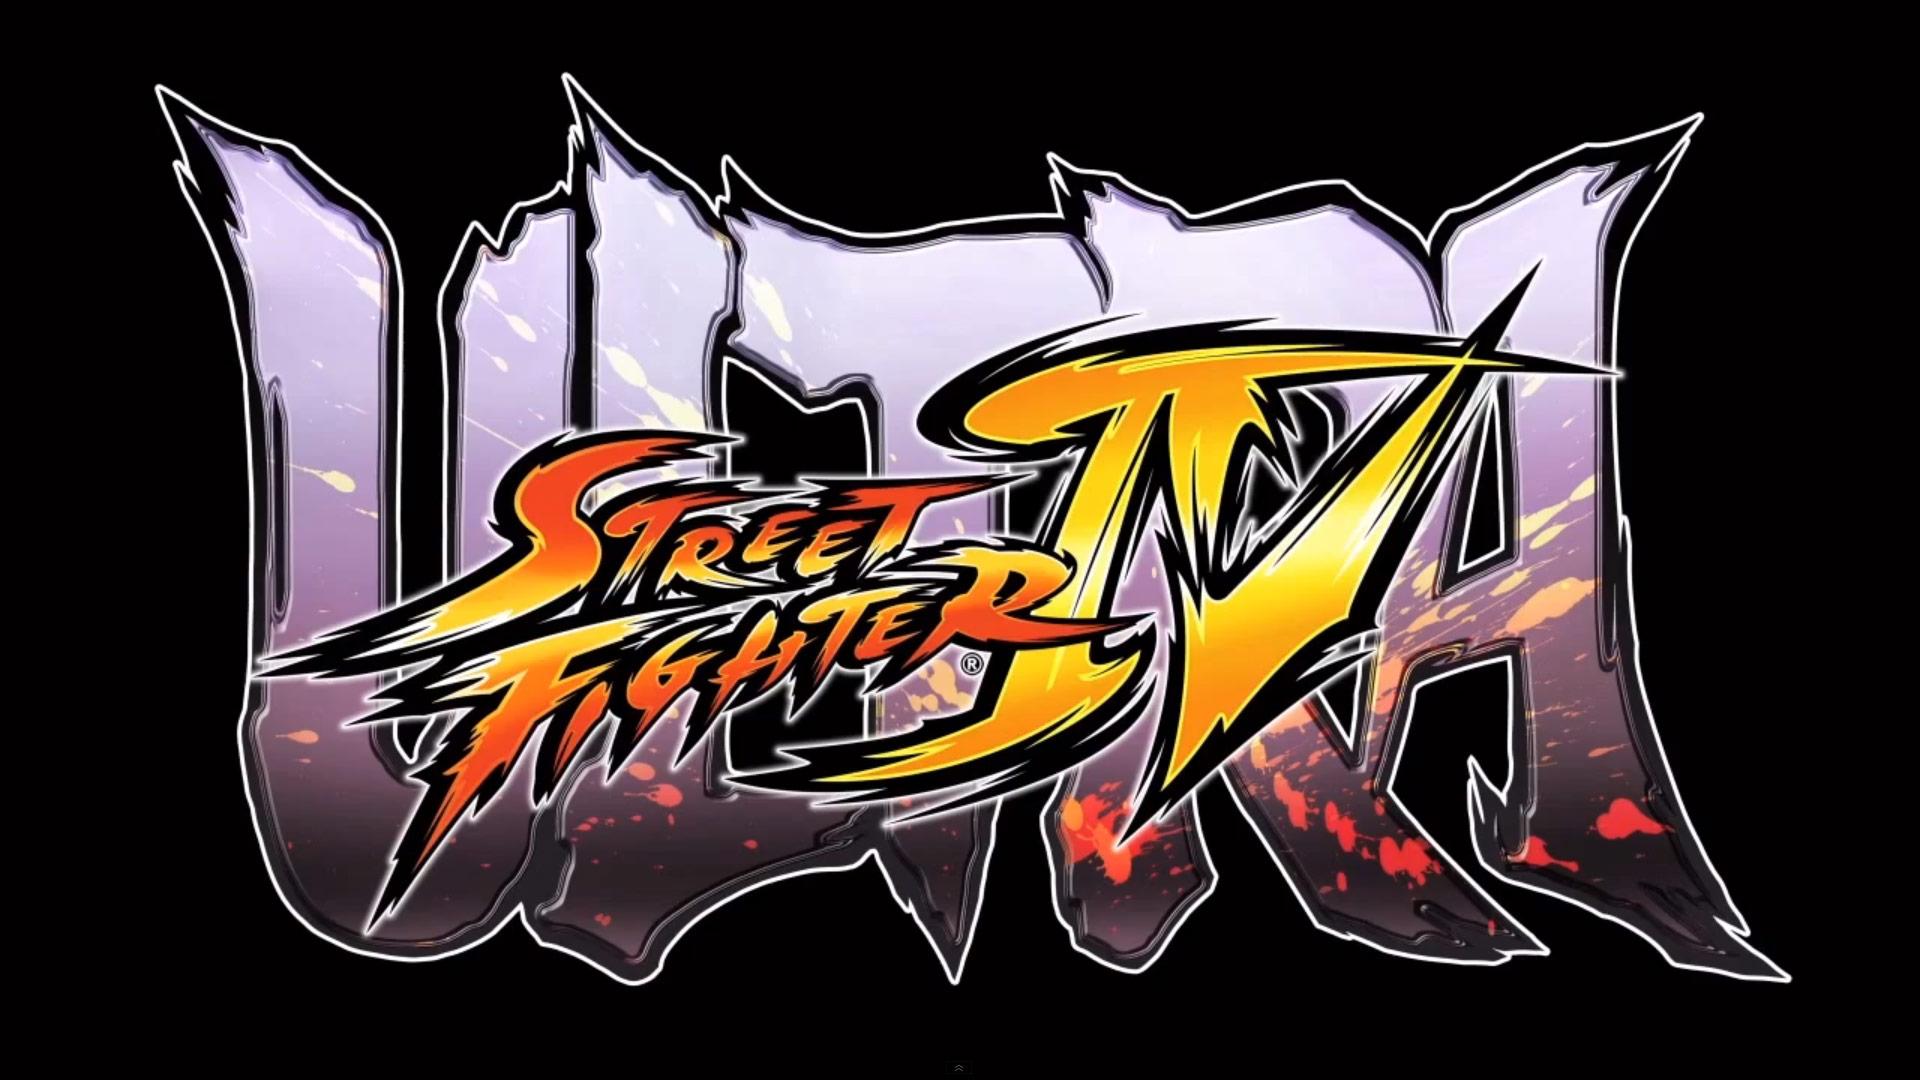 Ultra Street Fighter IV New Bonanza! Details Ensue